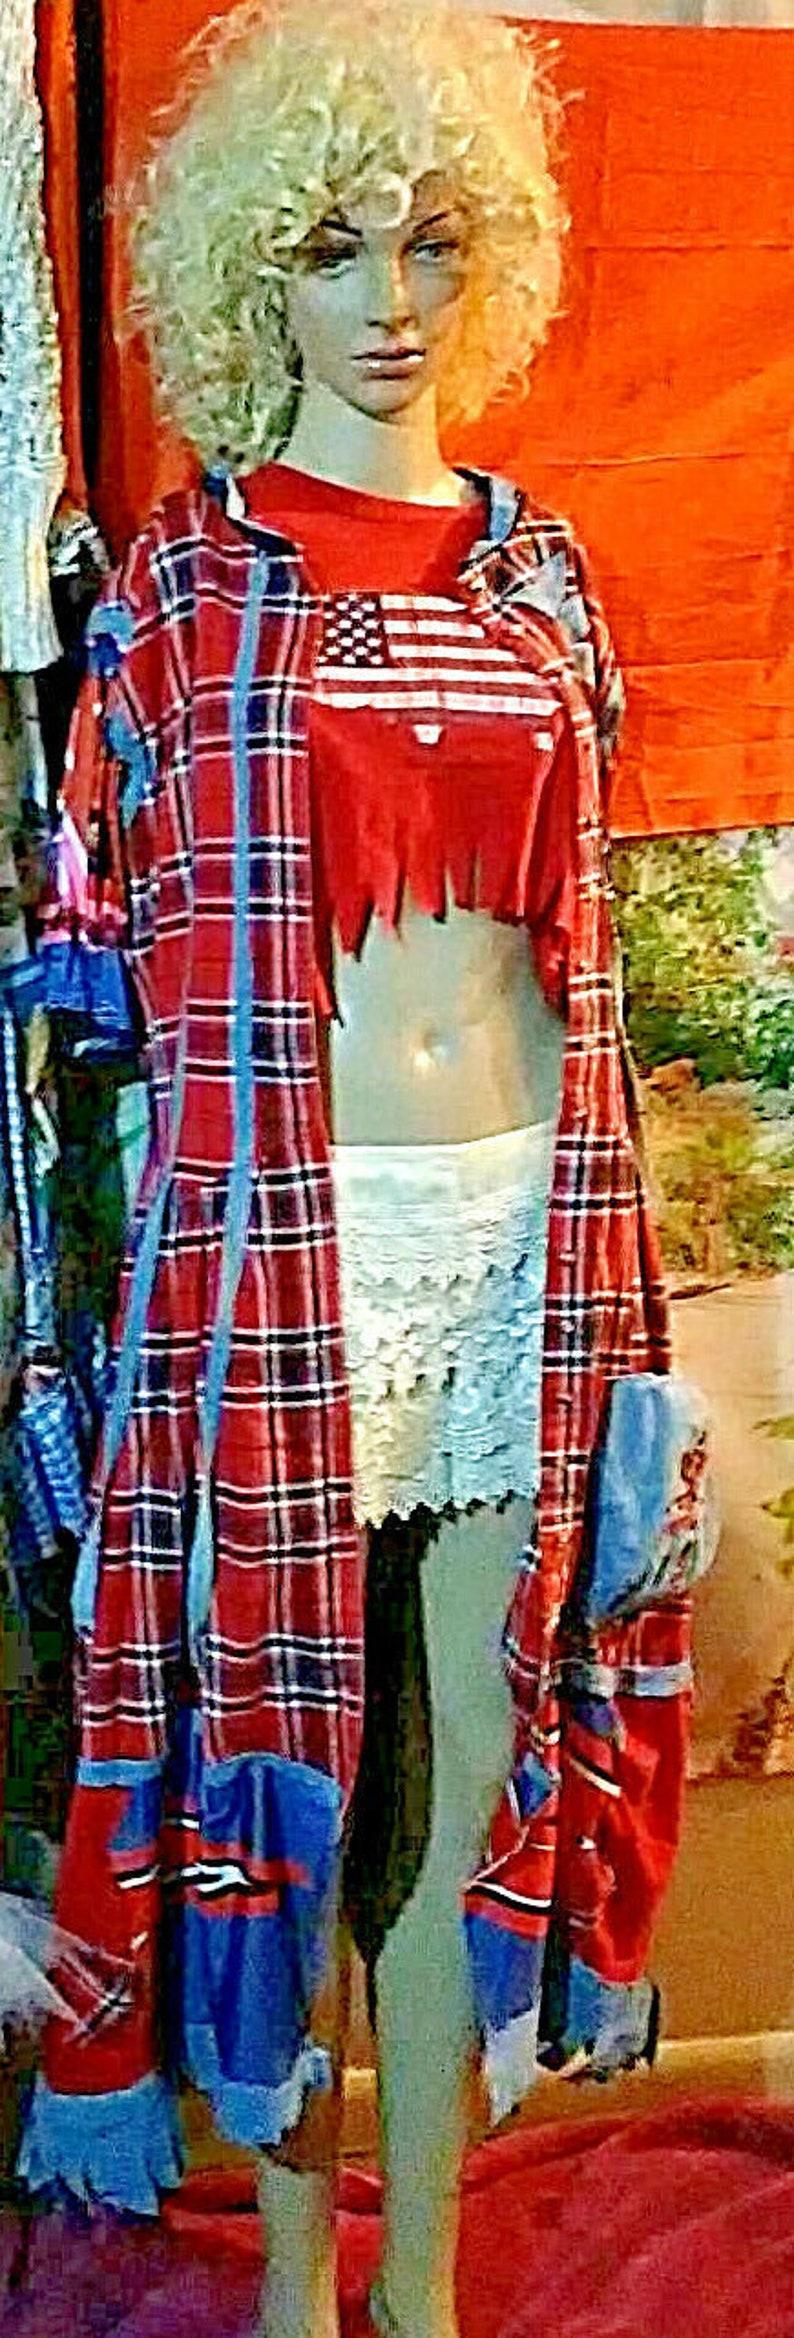 Sale,Free SHipp dress upcycled ooak dress tunic jacket Handmade dress country western boho dress tunic  gypsy,steampunk  Koolhanddesigns